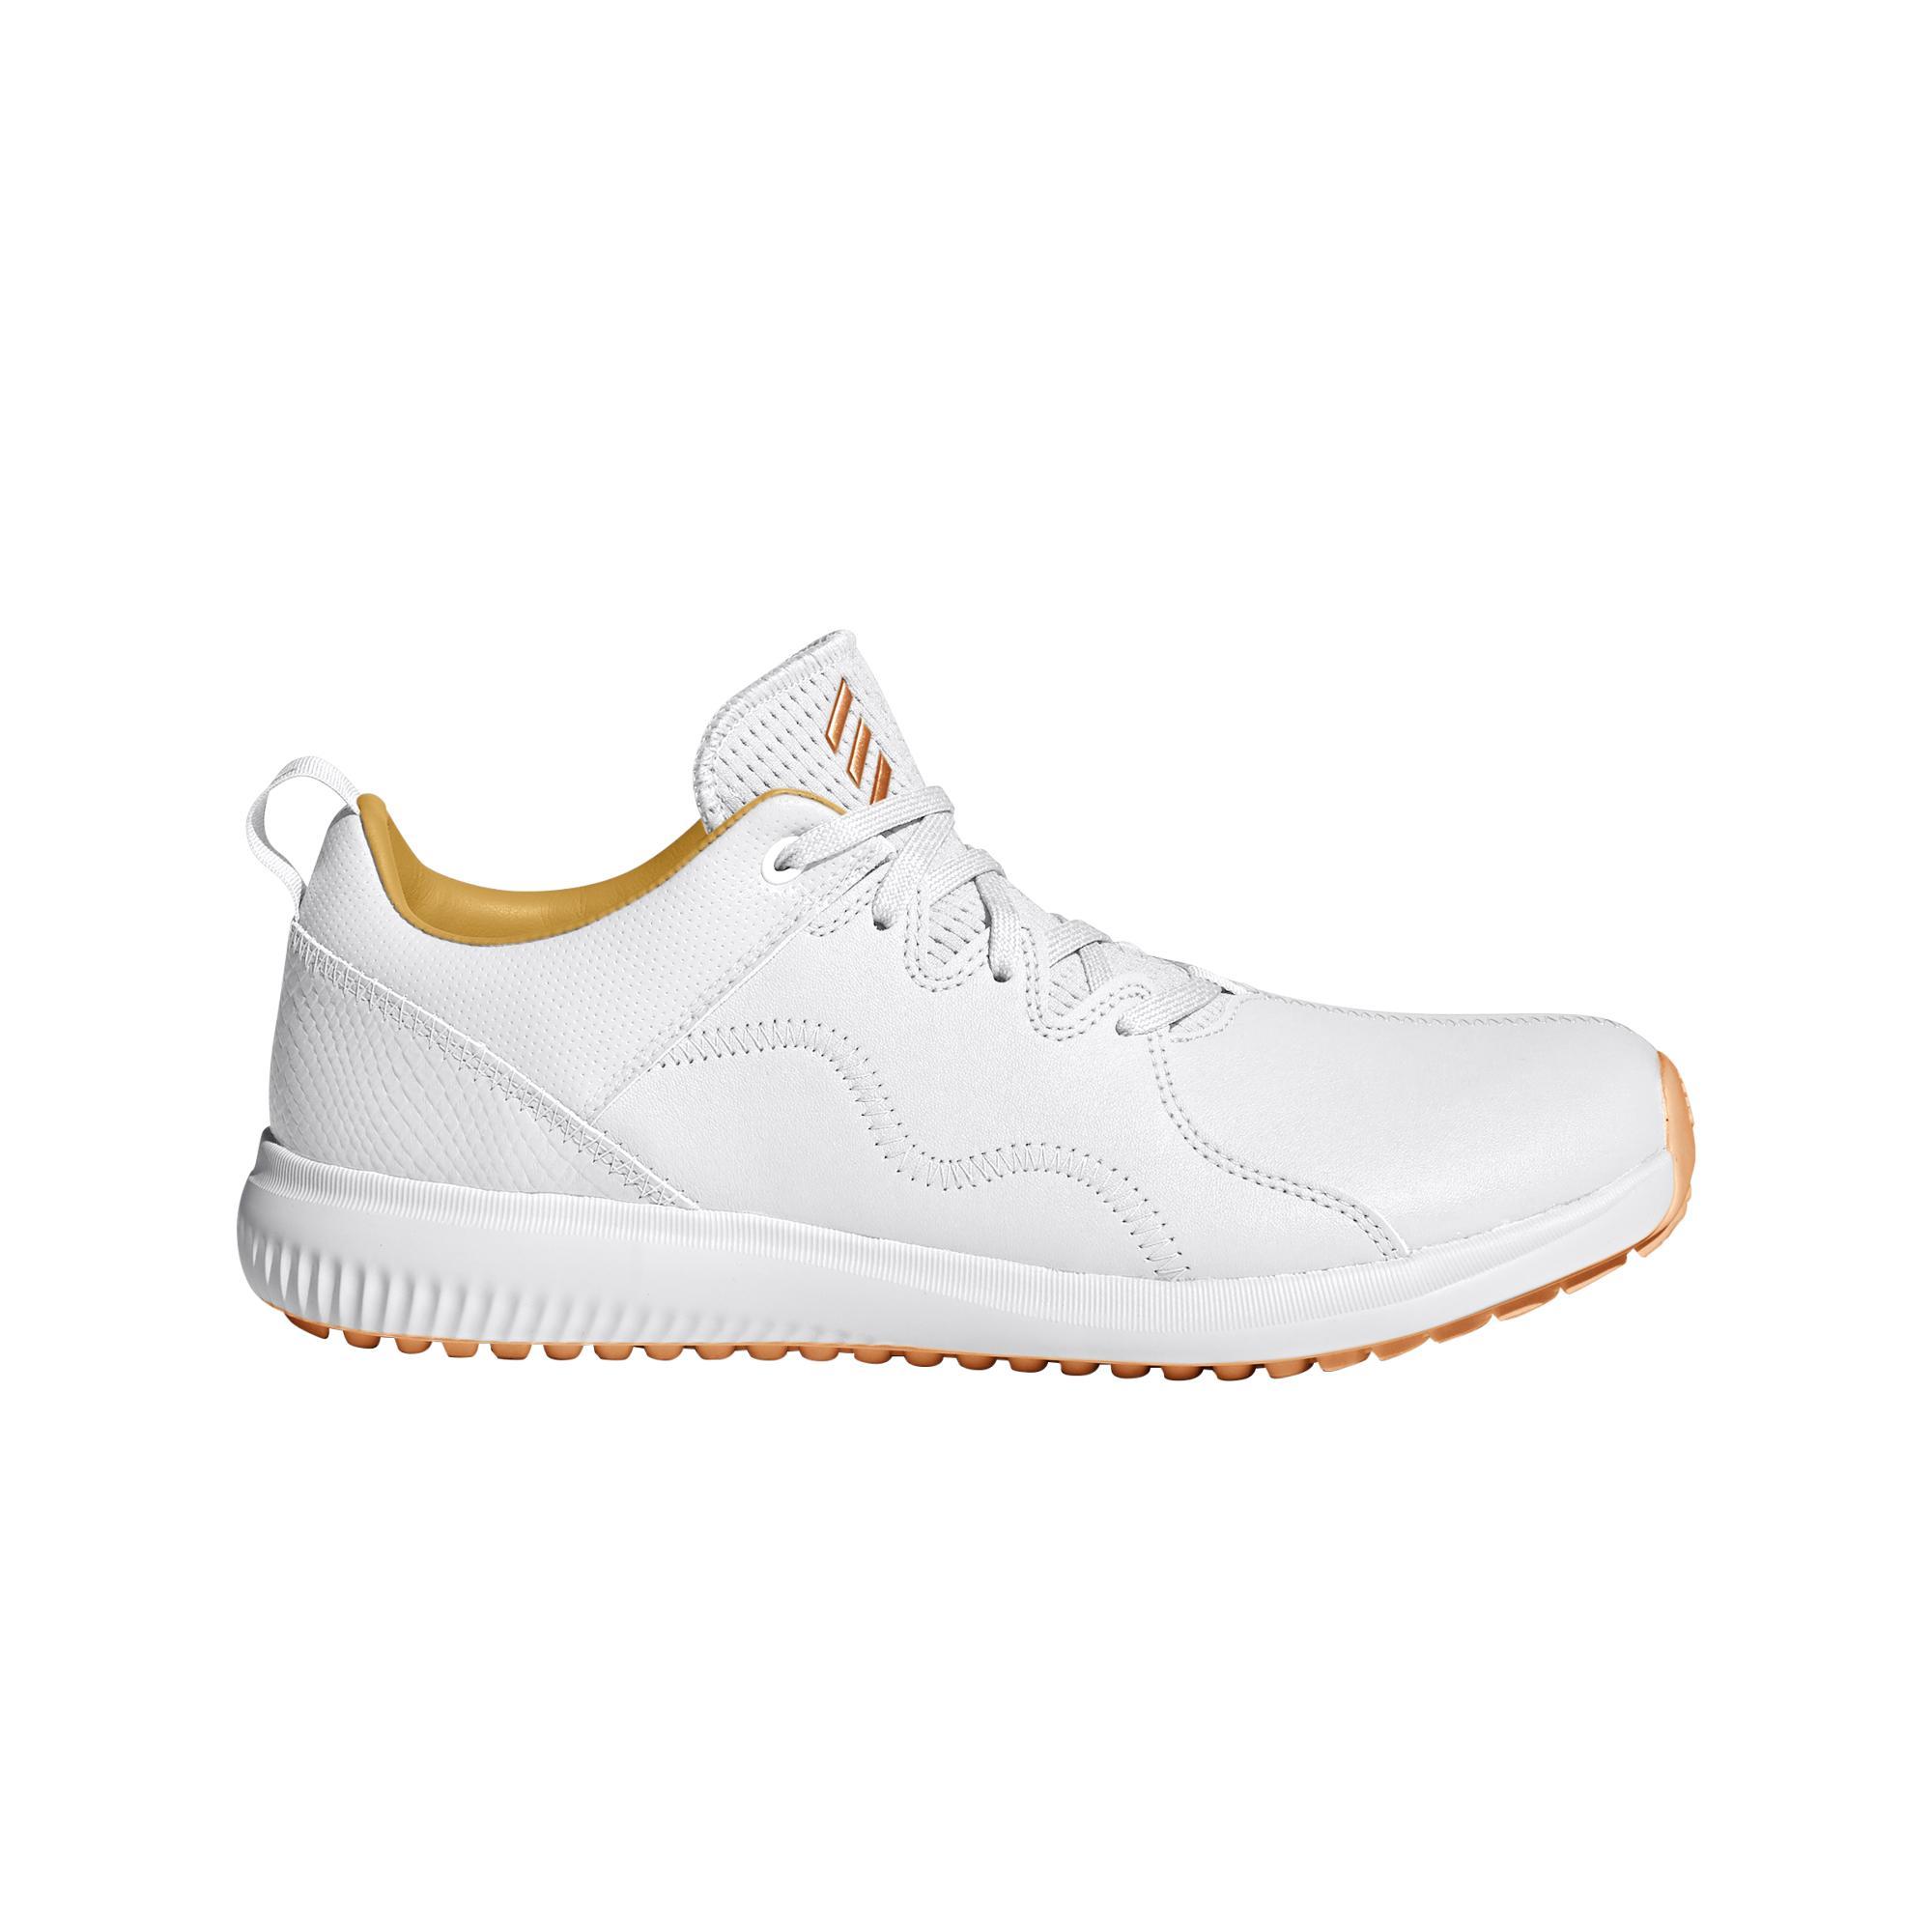 Men's Adicross PPF Spikeless Golf Shoe - White